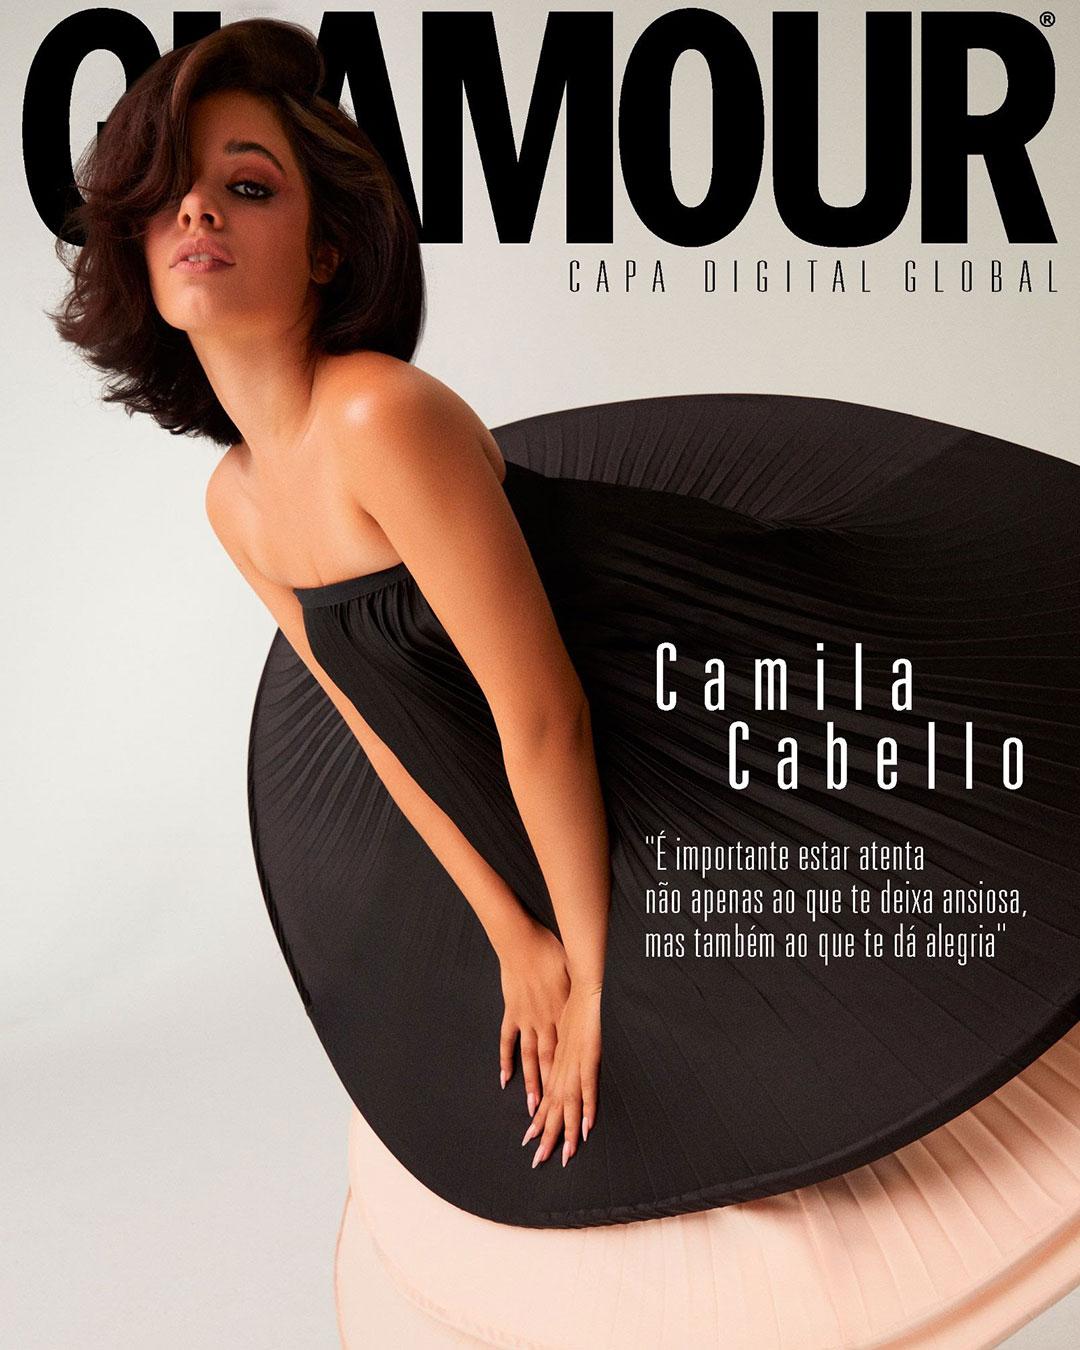 Camila Cabello Glamour 2021 9 min - Фото: Camila Cabello на обложке журнала Glamour